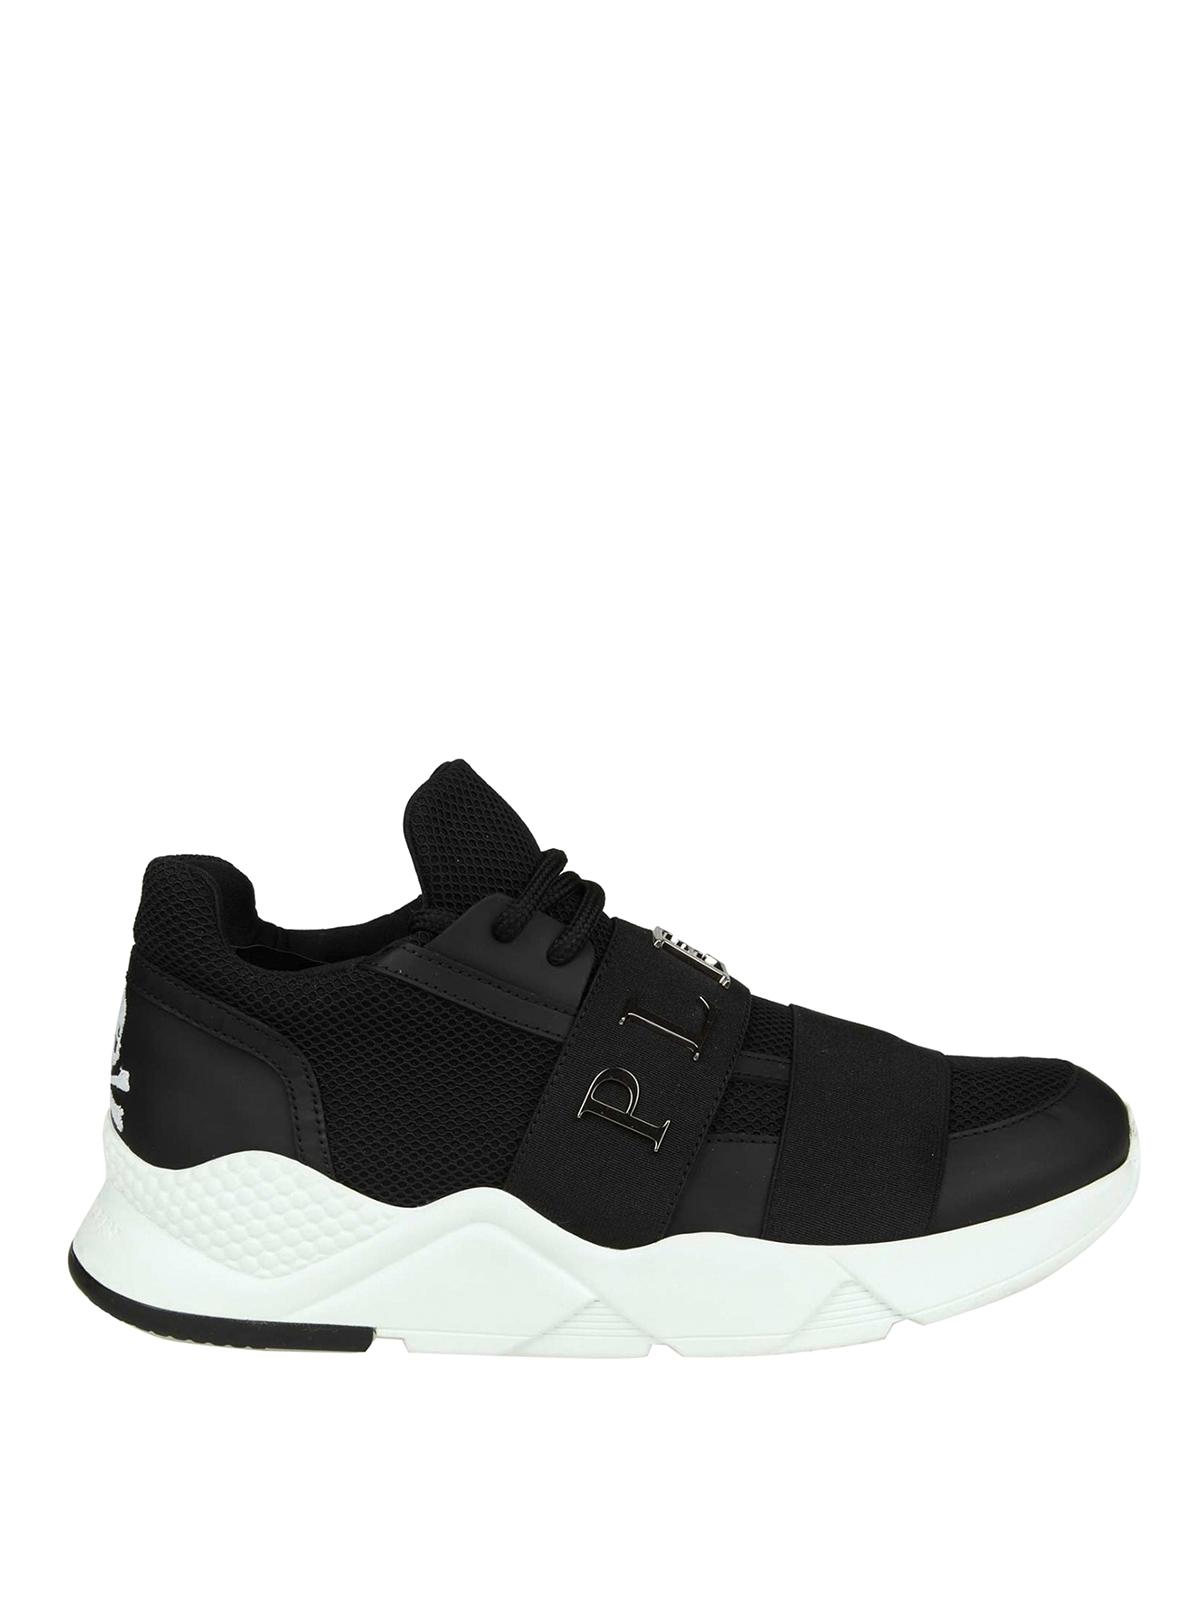 e4f2fd6862d Philipp Plein - Runner Statement black sneakers - trainers ...